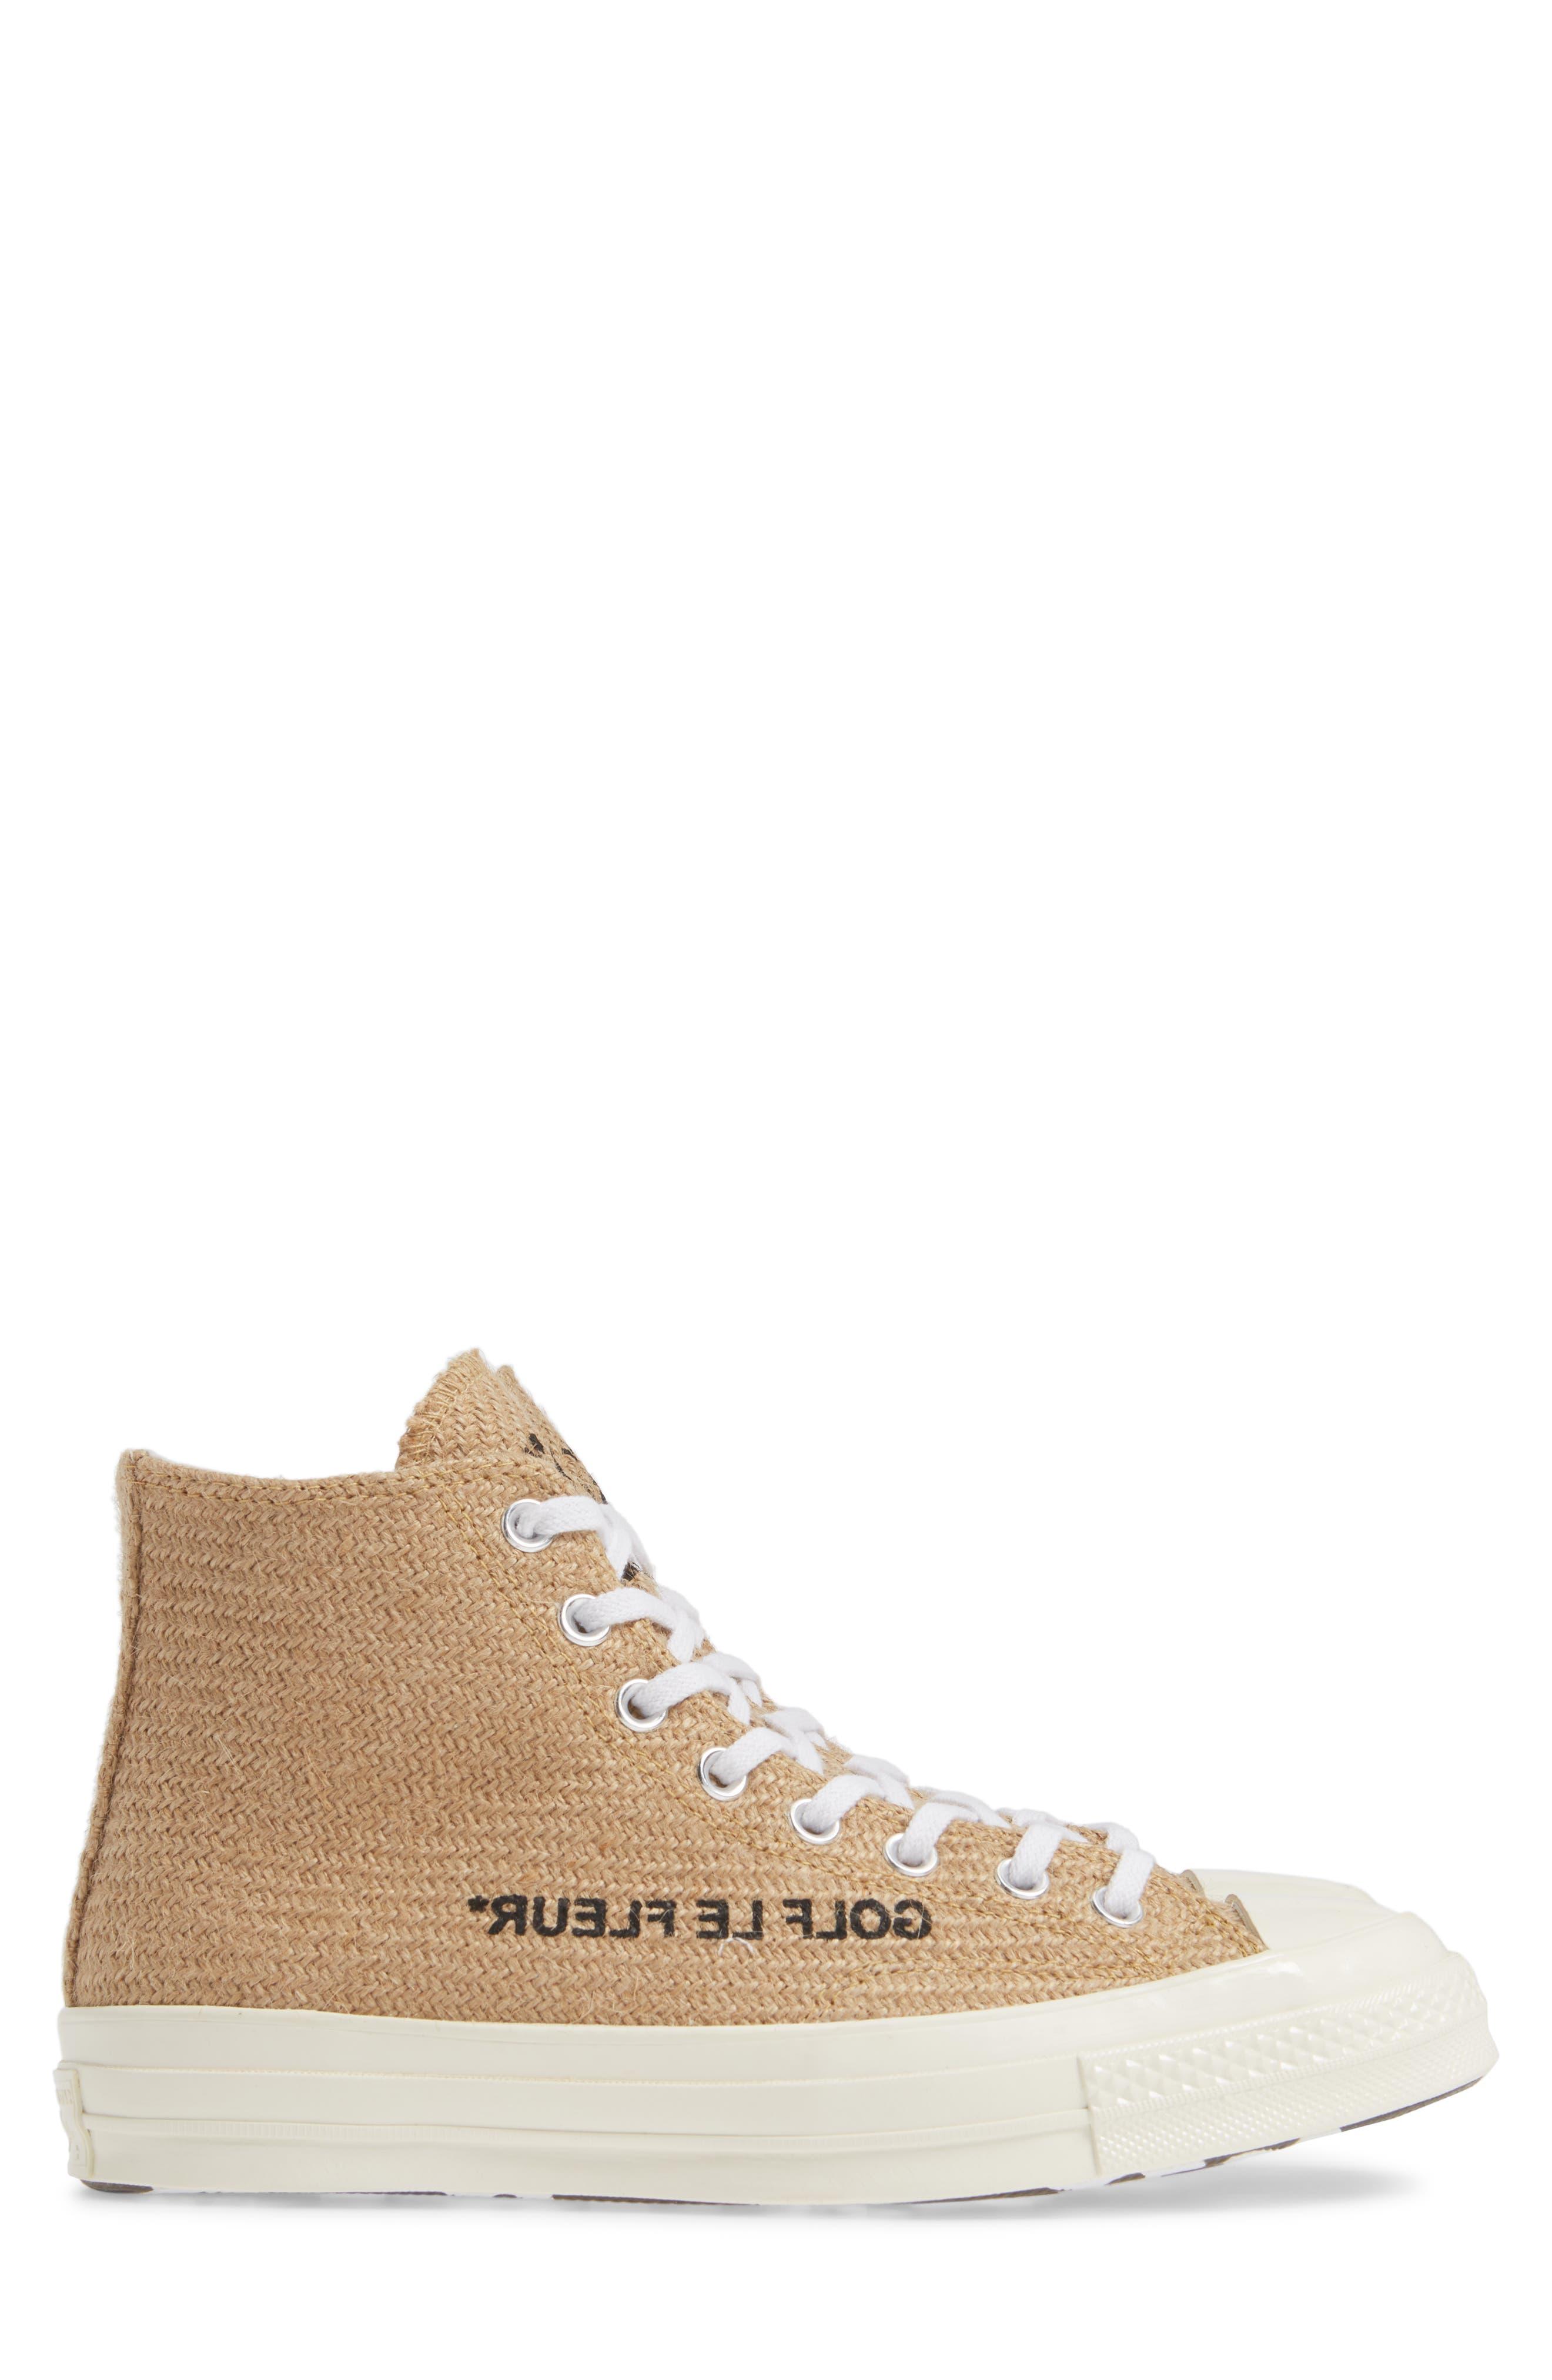 x GOLF le FLEUR* Chuck 70 High Top Sneaker,                             Alternate thumbnail 3, color,                             209